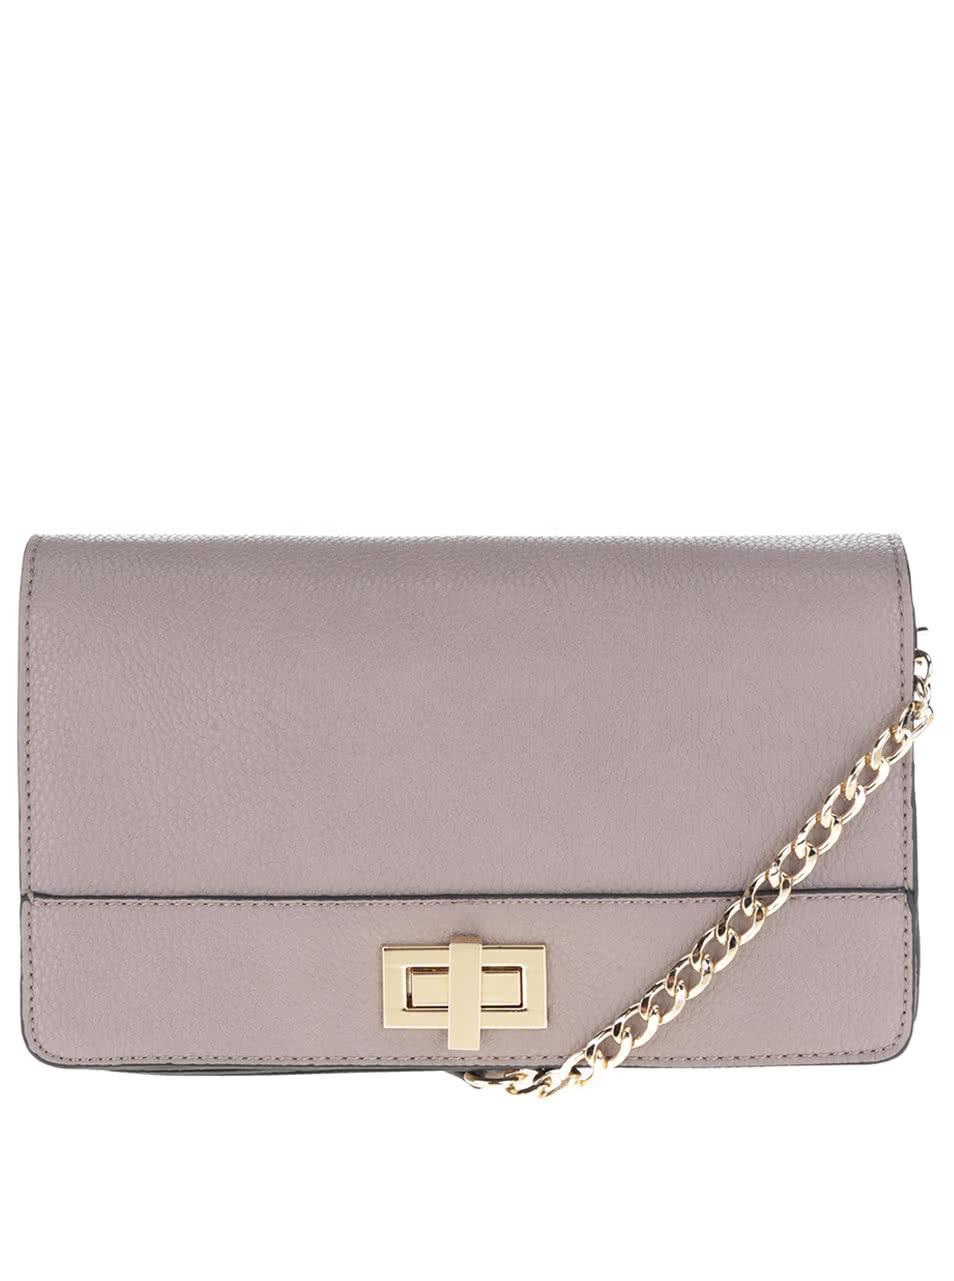 f5ec6bdbb5 Hnedo-sivá crossbody kabelka s detailmi v zlatej farbe Gionni Adrienne ...